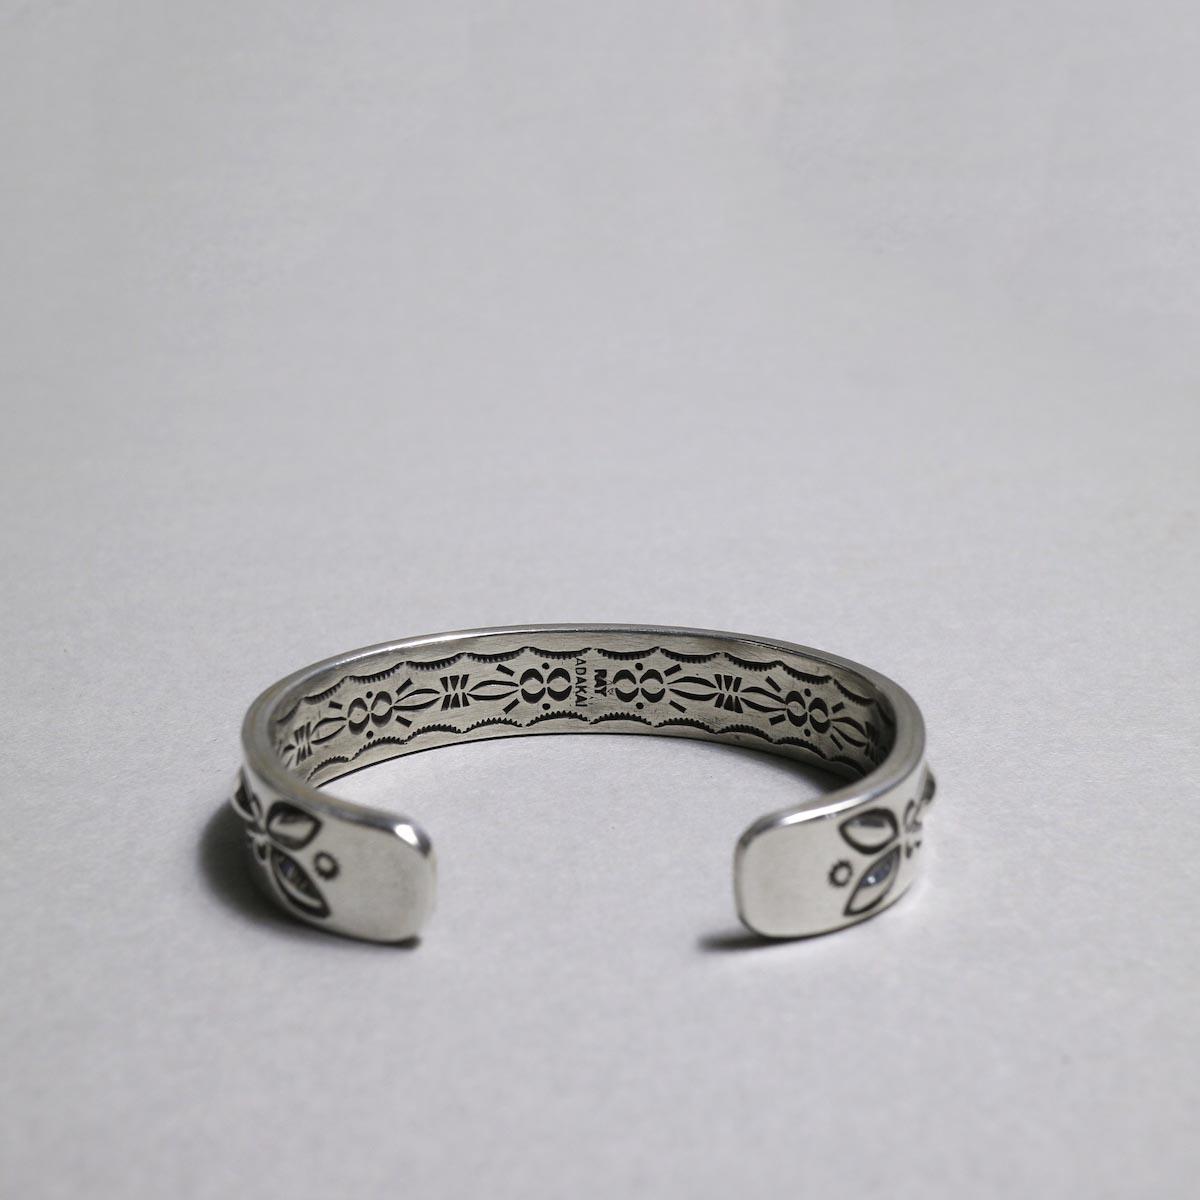 RAY ADAKAI / Double Stamp Bracelet (A)内側スタンプ